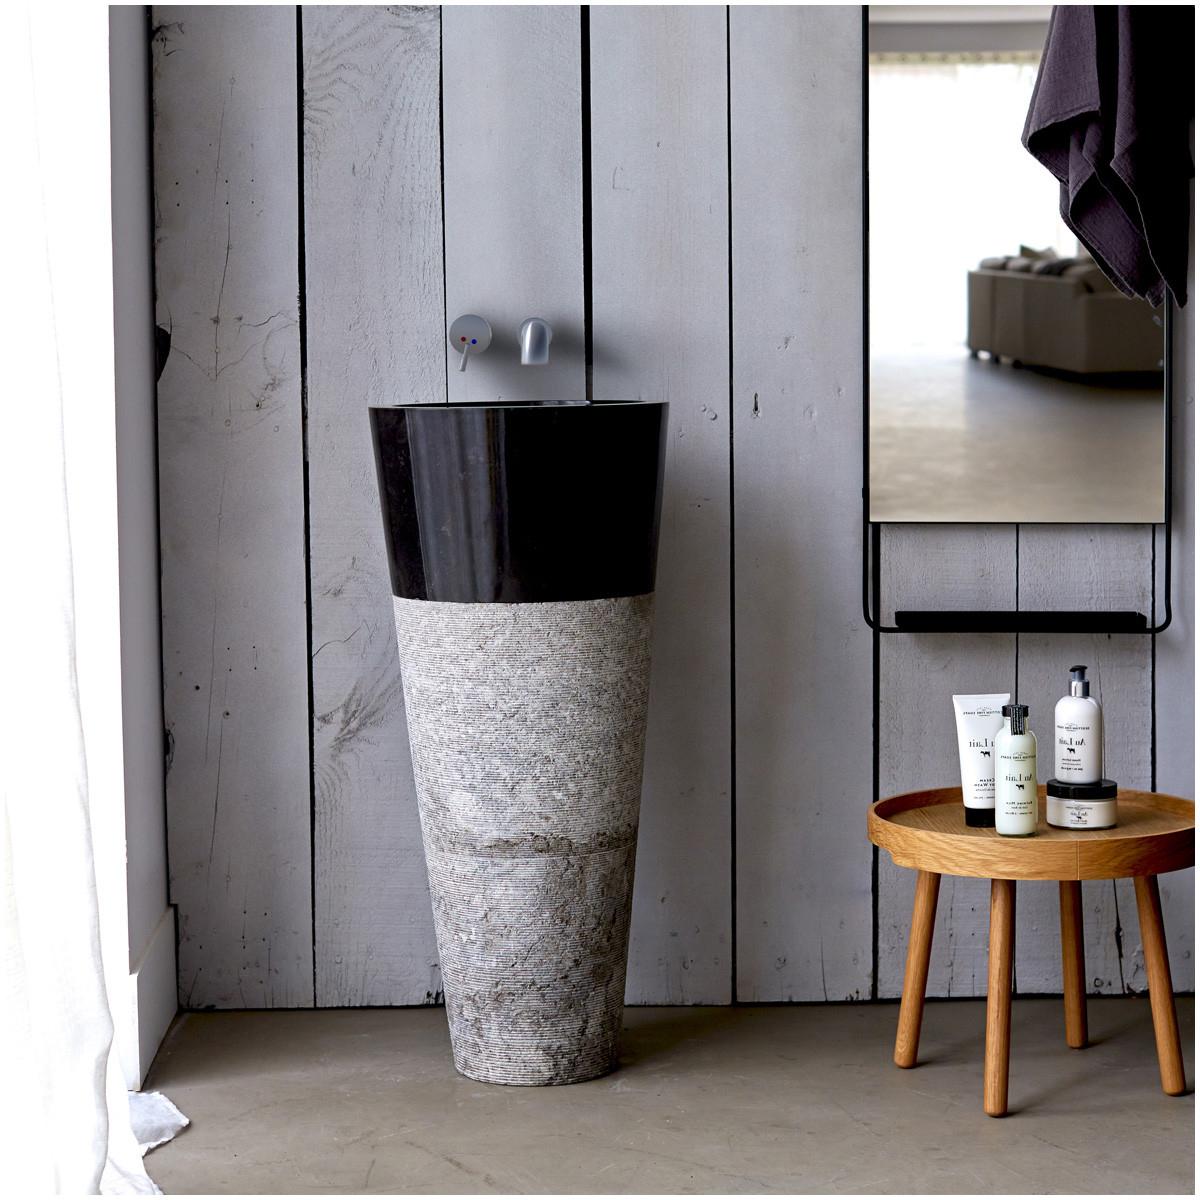 Meuble Vasque Salle De Bain but Inspirant Photos Mini Réfrigérateur Darty Luxe Meuble Colonne Salle De Bain but 7